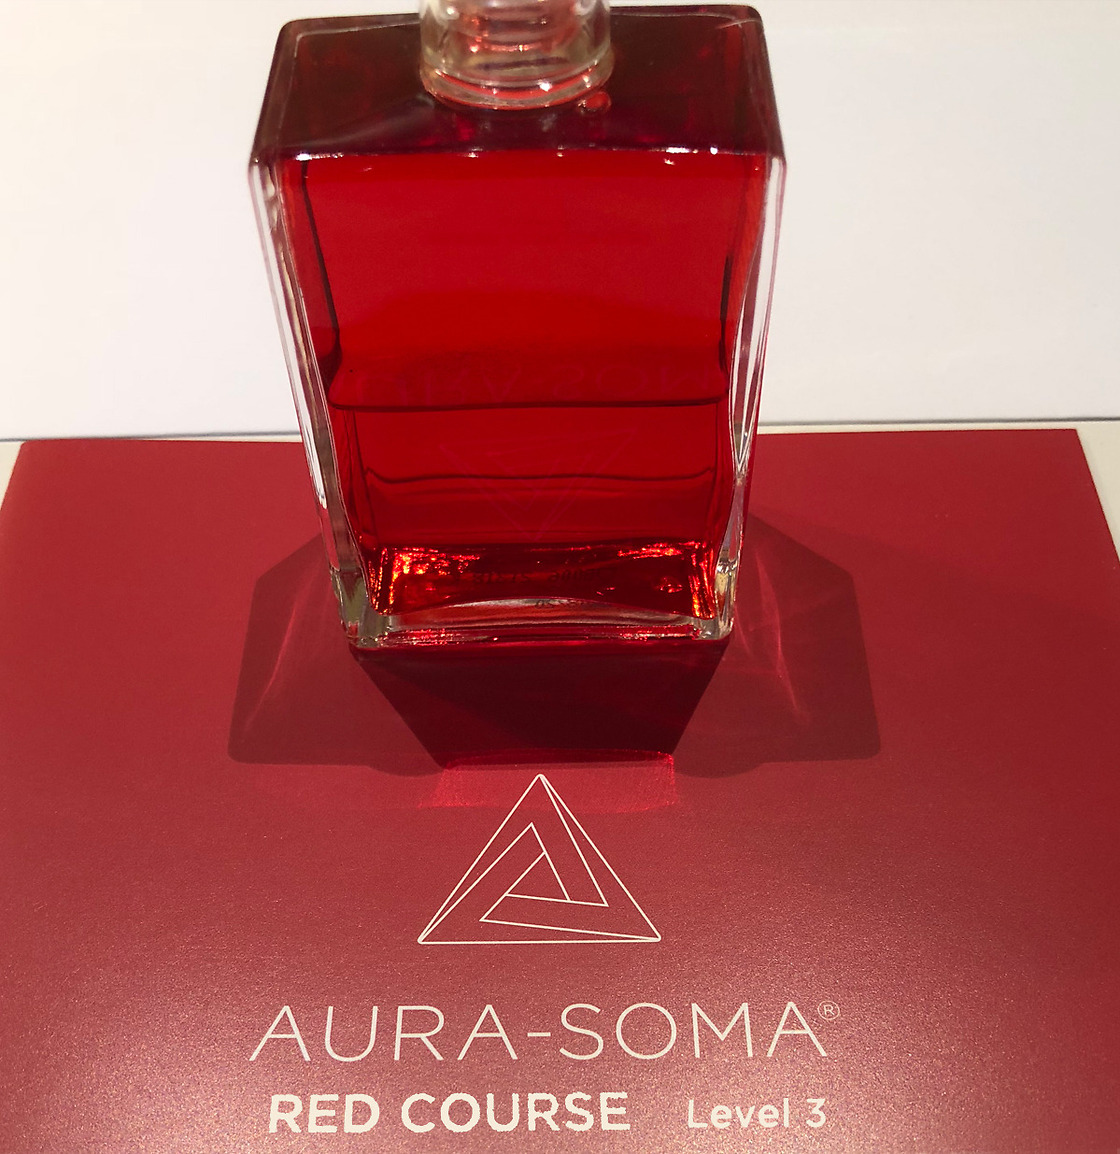 Aura-soma i Stockholm Red Course Level 3